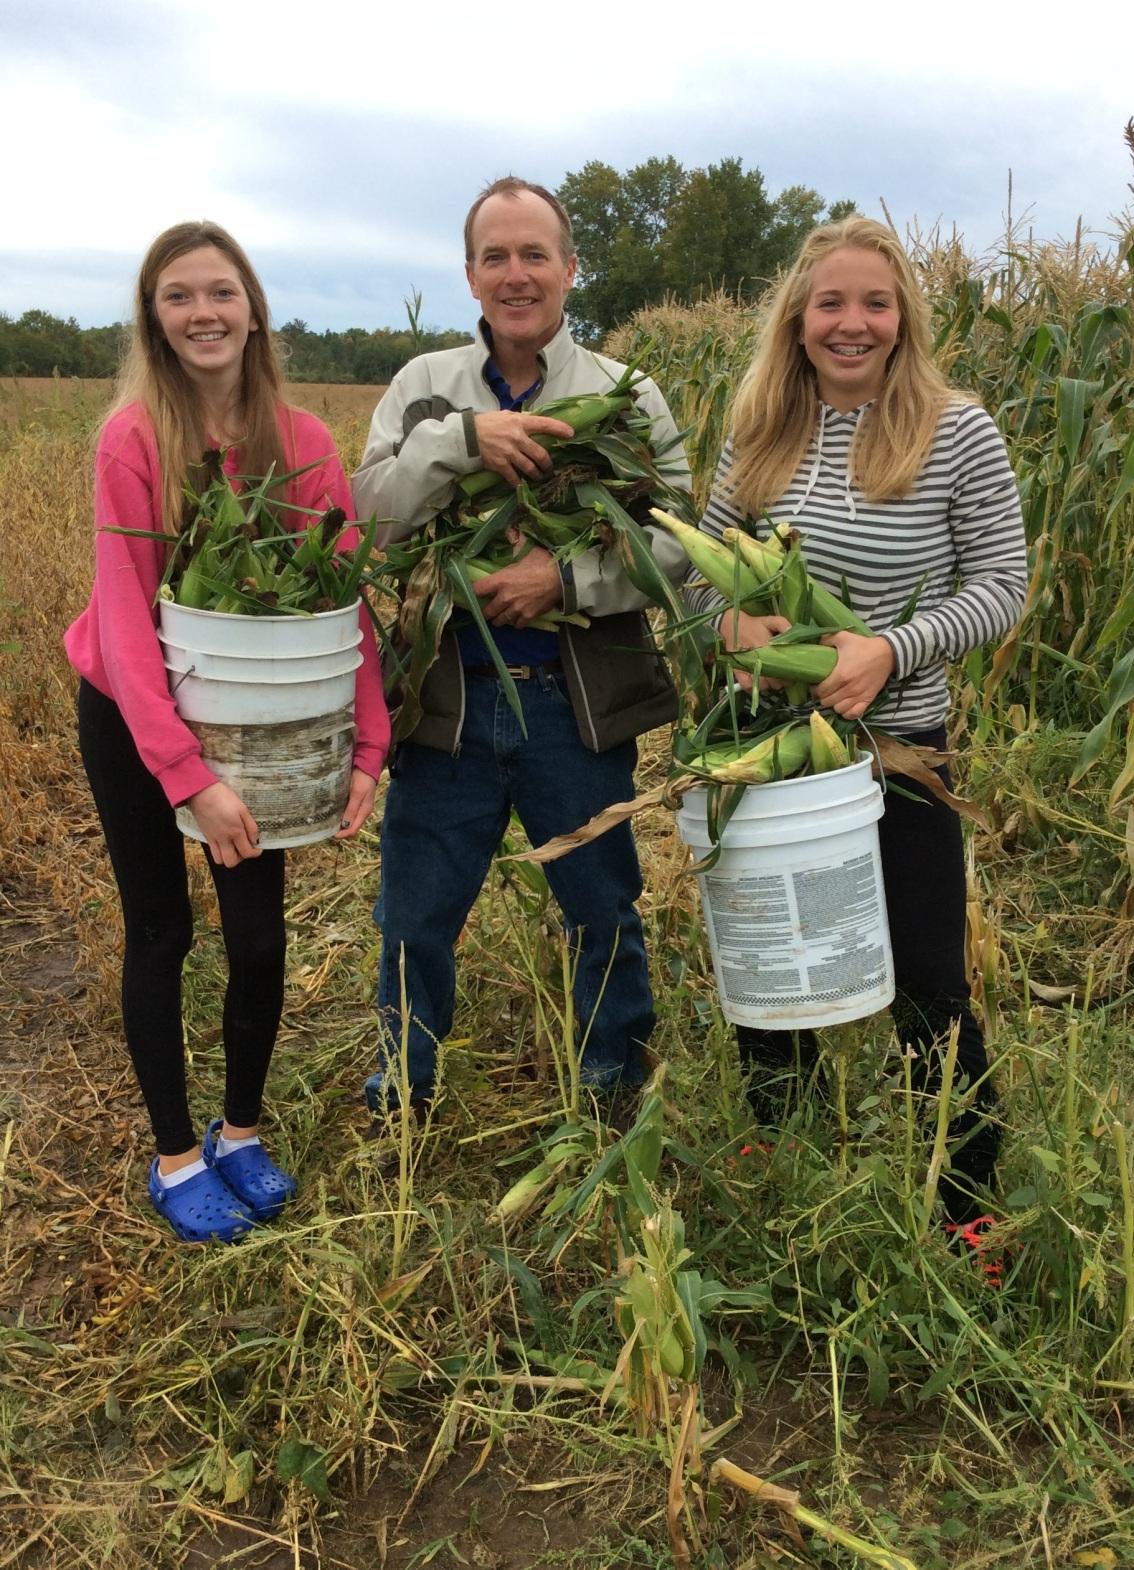 Fall harvest – husking corn inMN